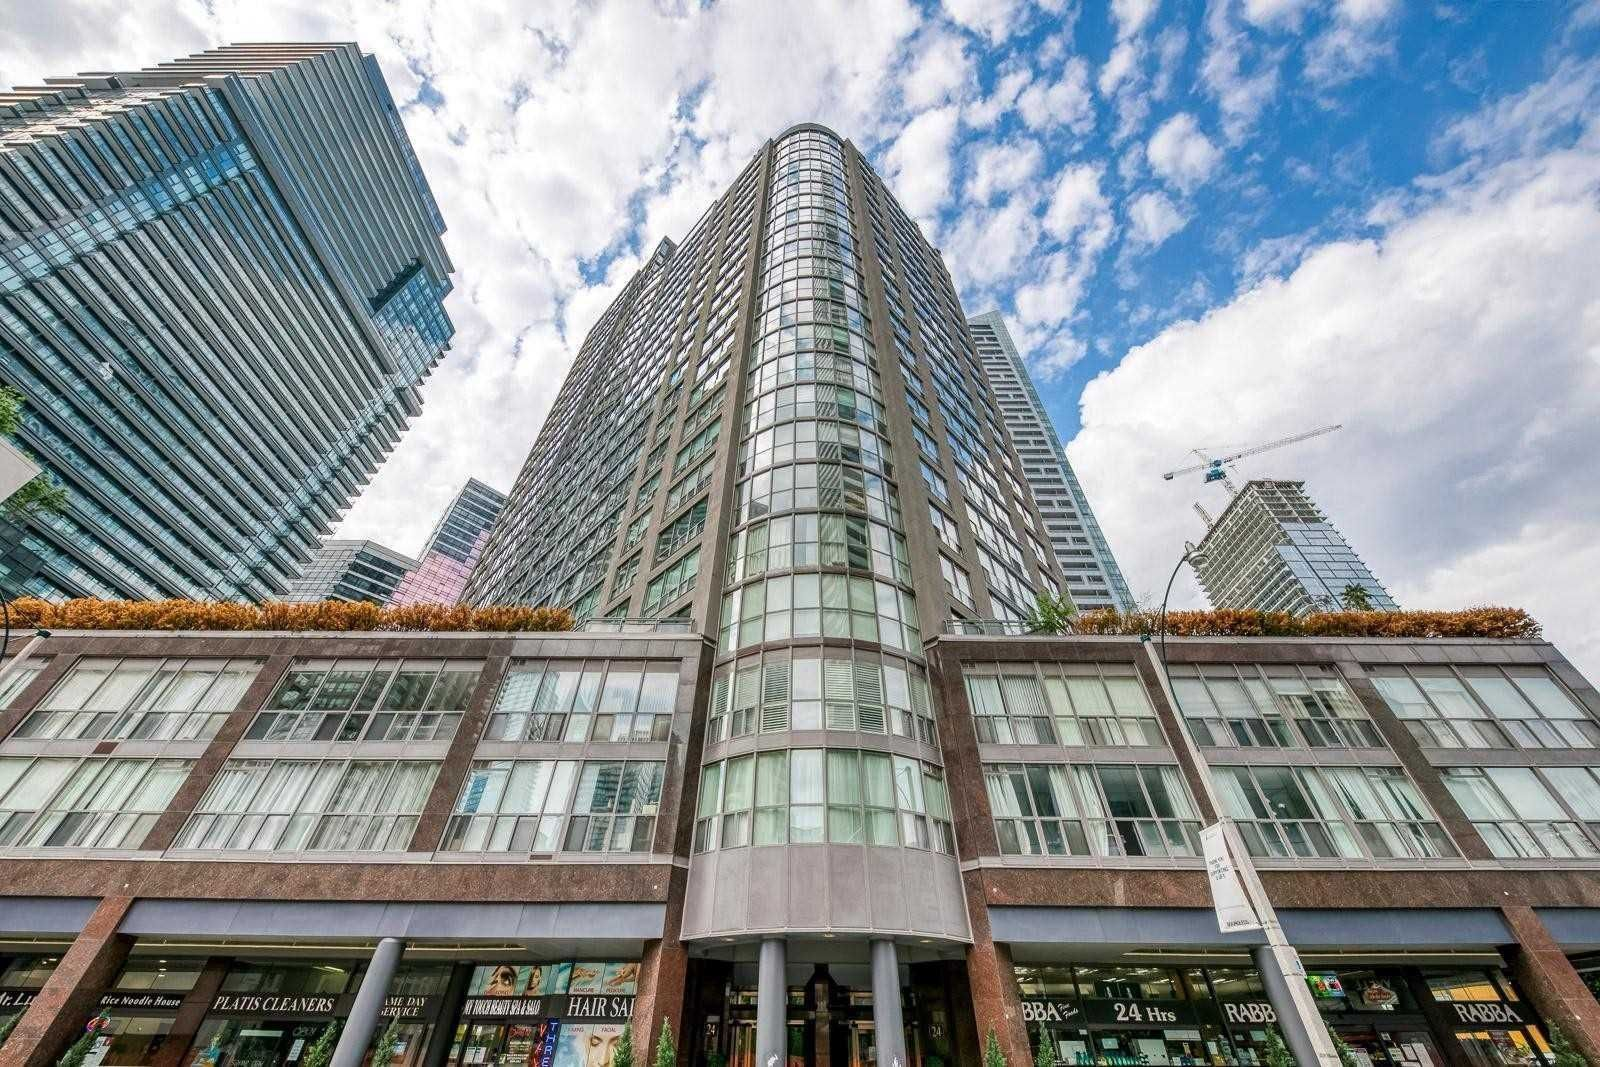 Main Photo: 1811 24 W Wellesley Street in Toronto: Bay Street Corridor Condo for lease (Toronto C01)  : MLS®# C5333031